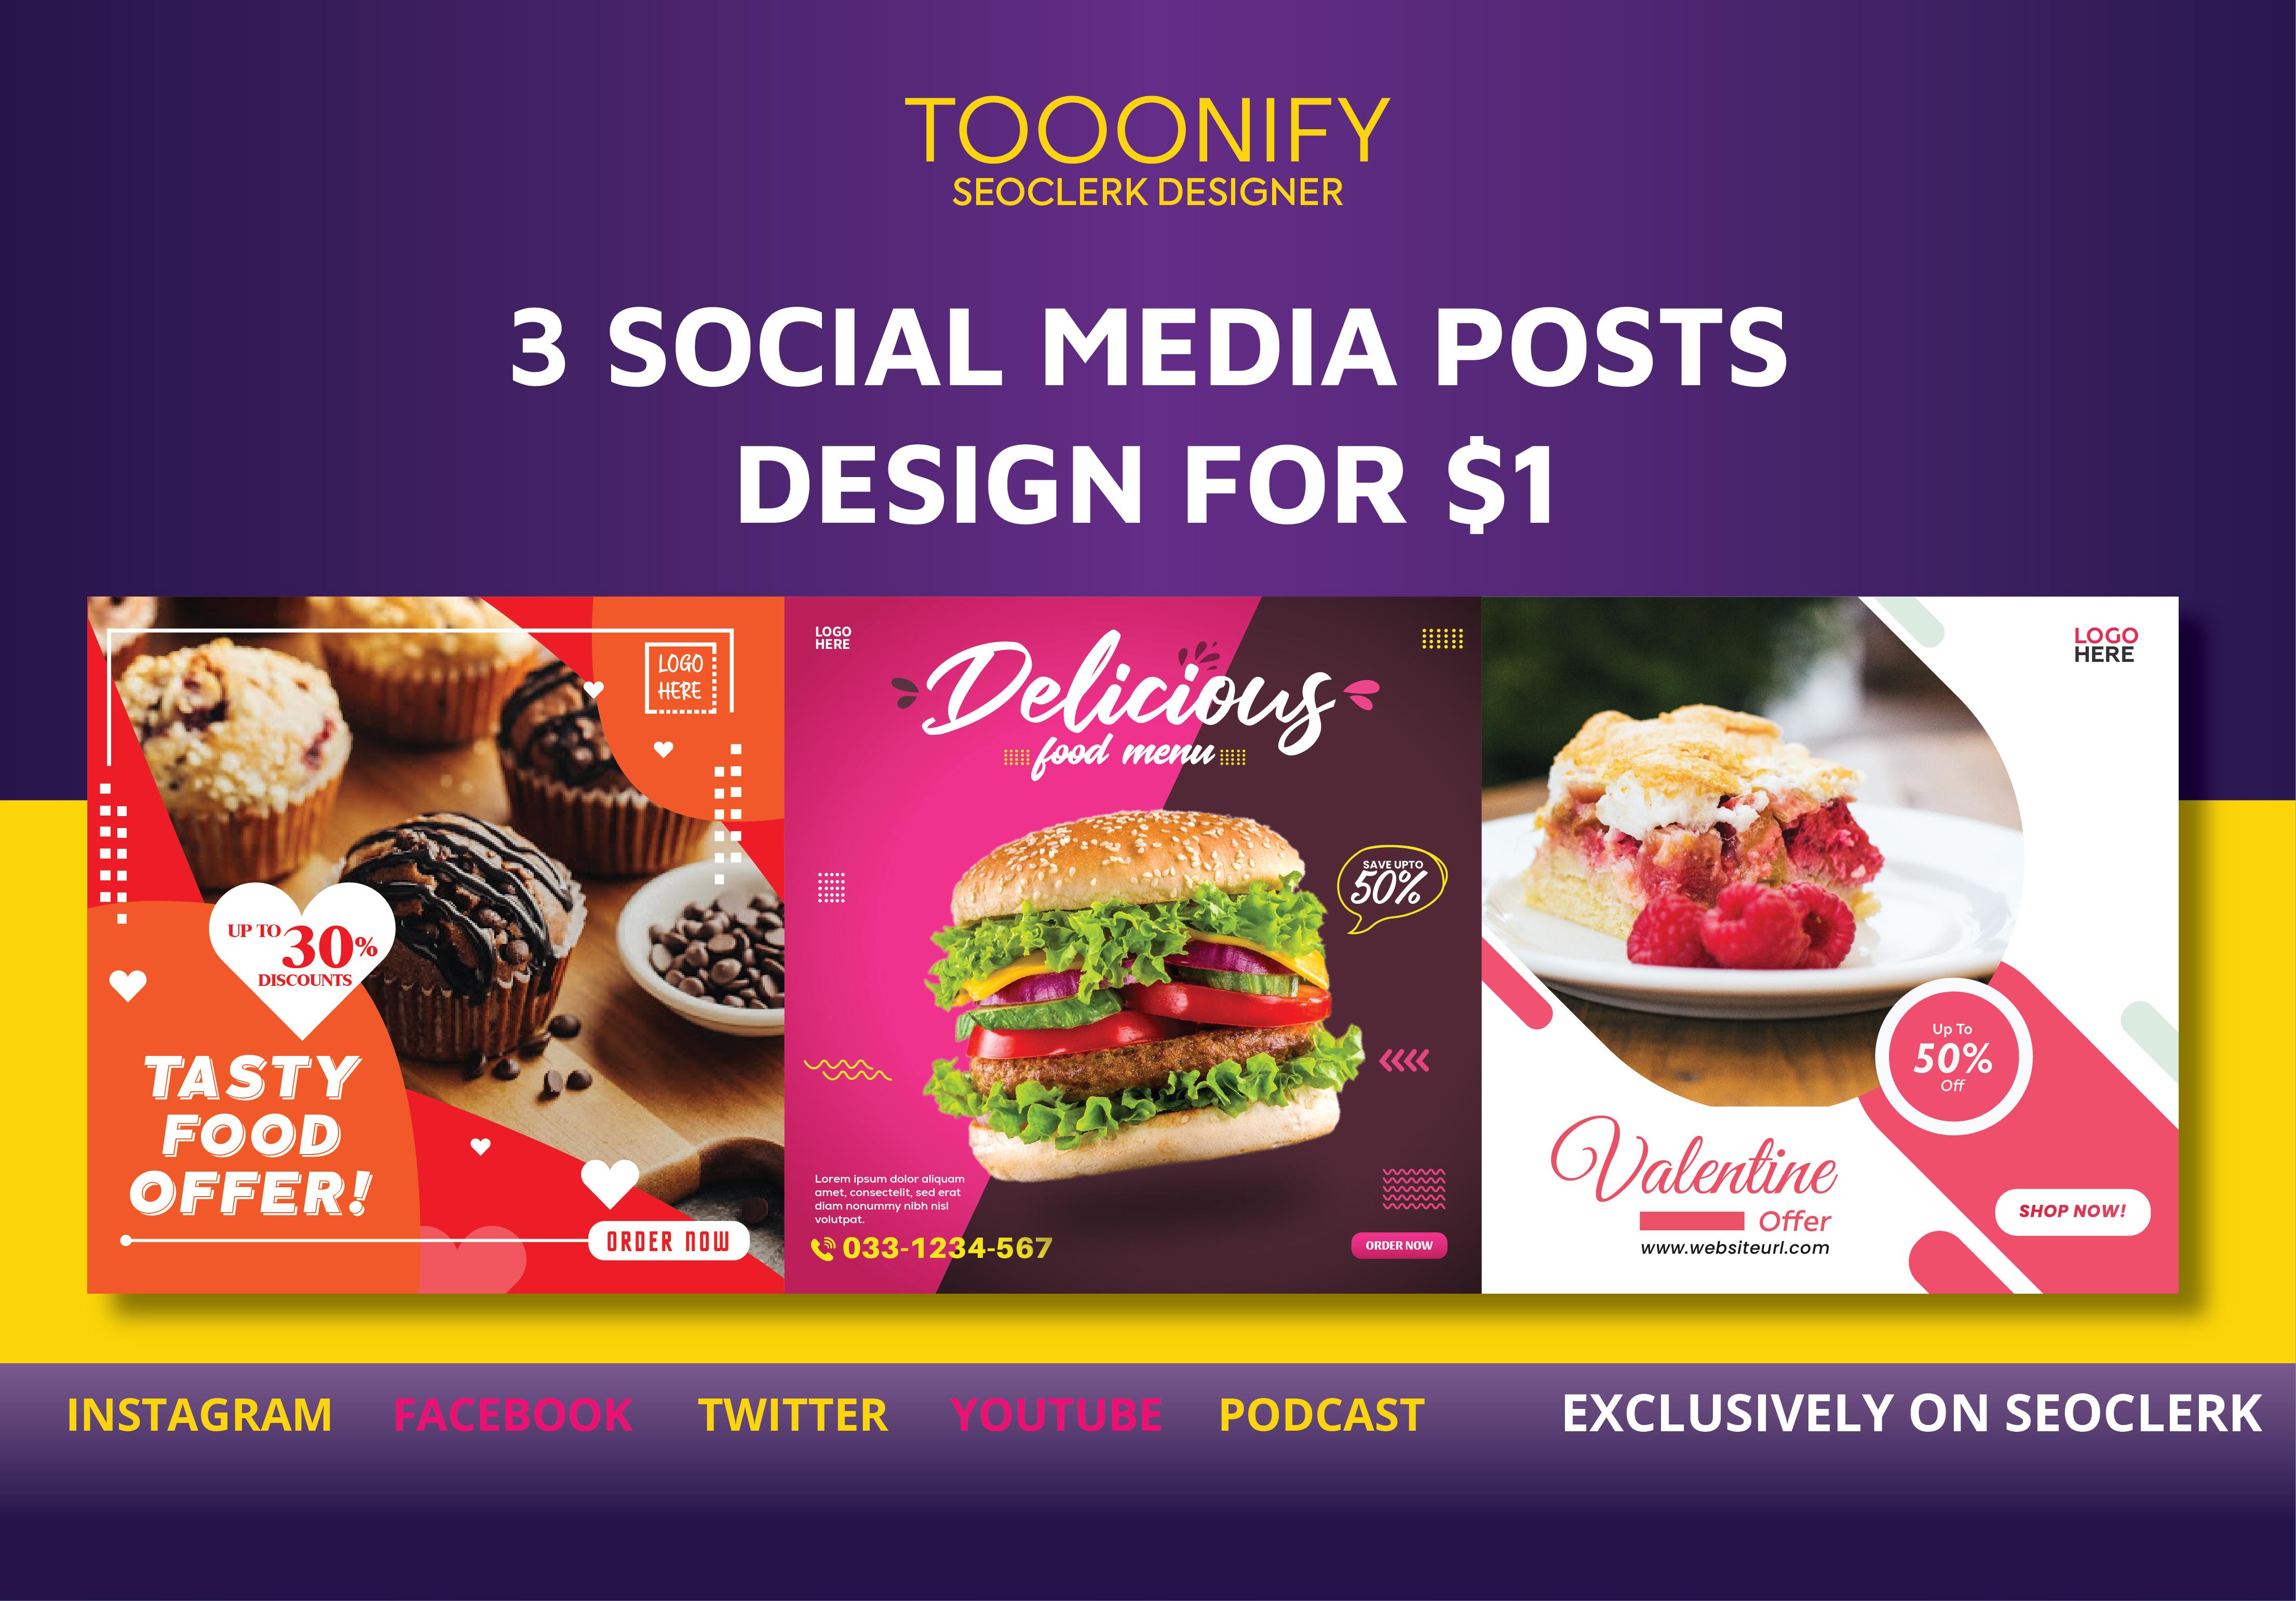 I will design 3 creative social media posts